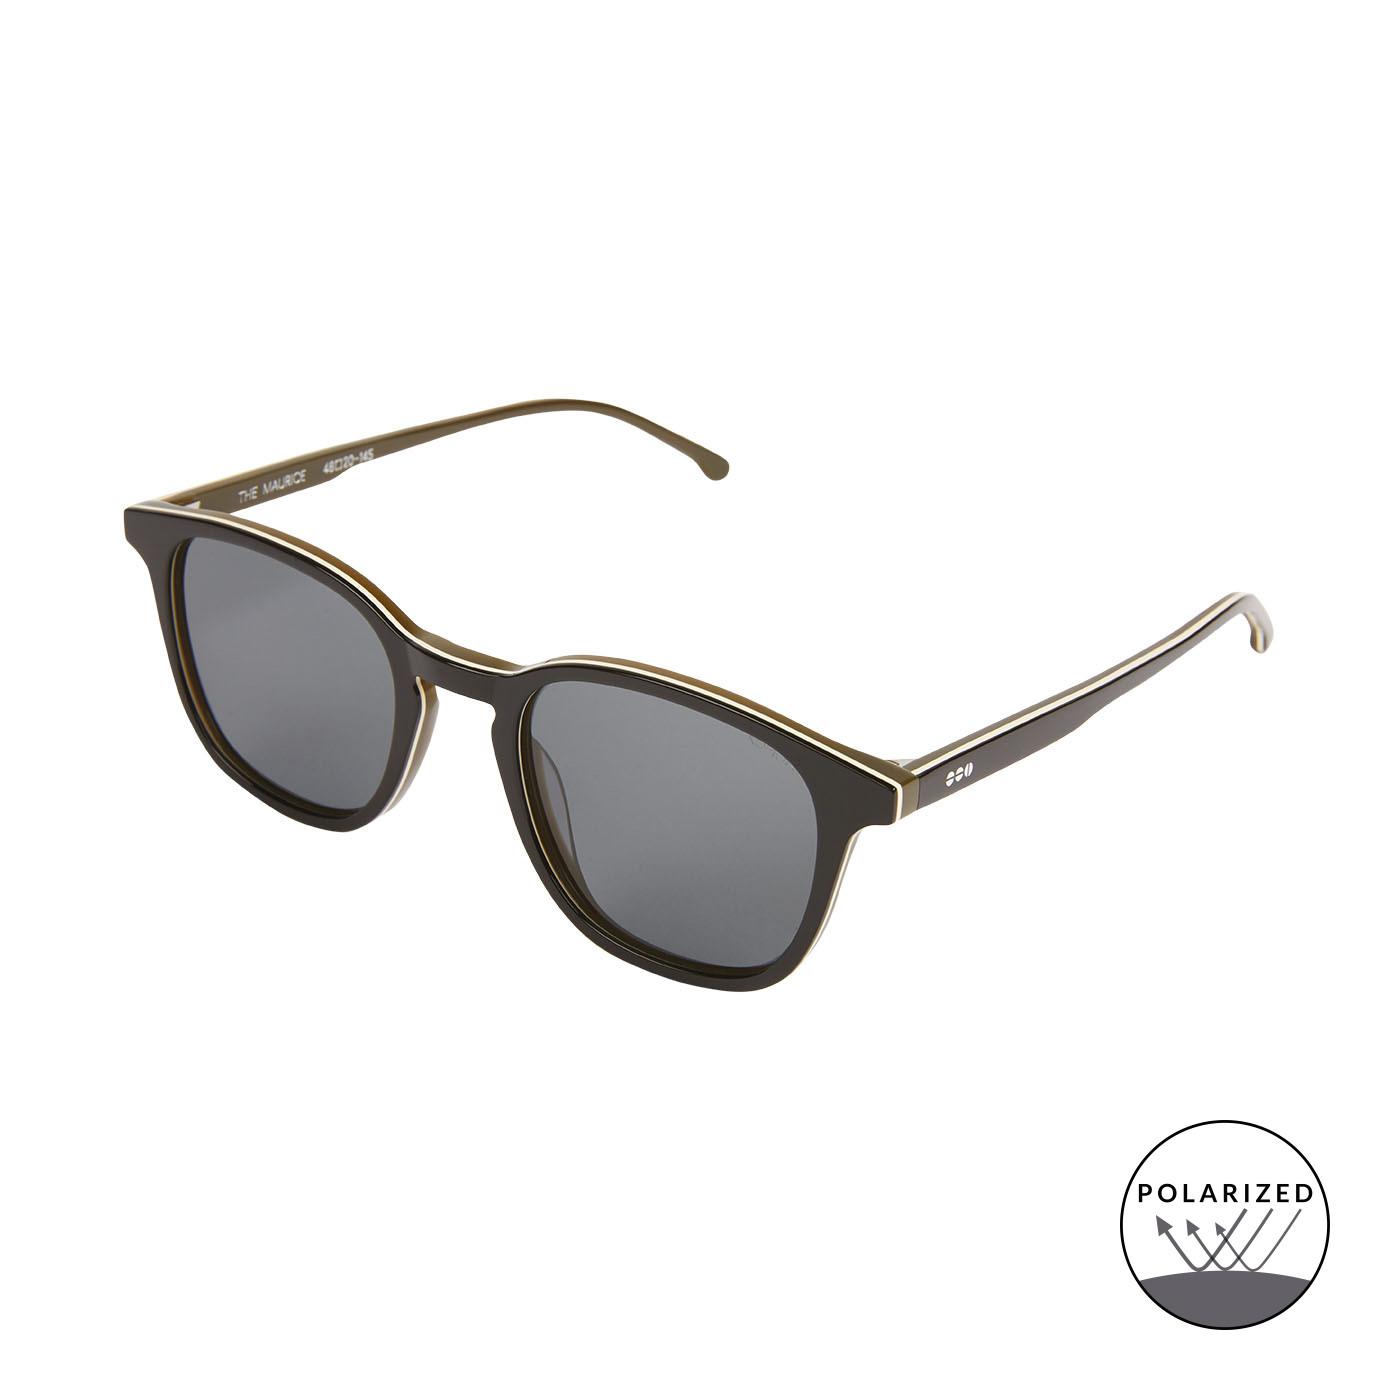 d68015d5e59 Komono Maurice Black Forest Gepolariseerde Zonnebril KOM-S4157 - Sunglasses